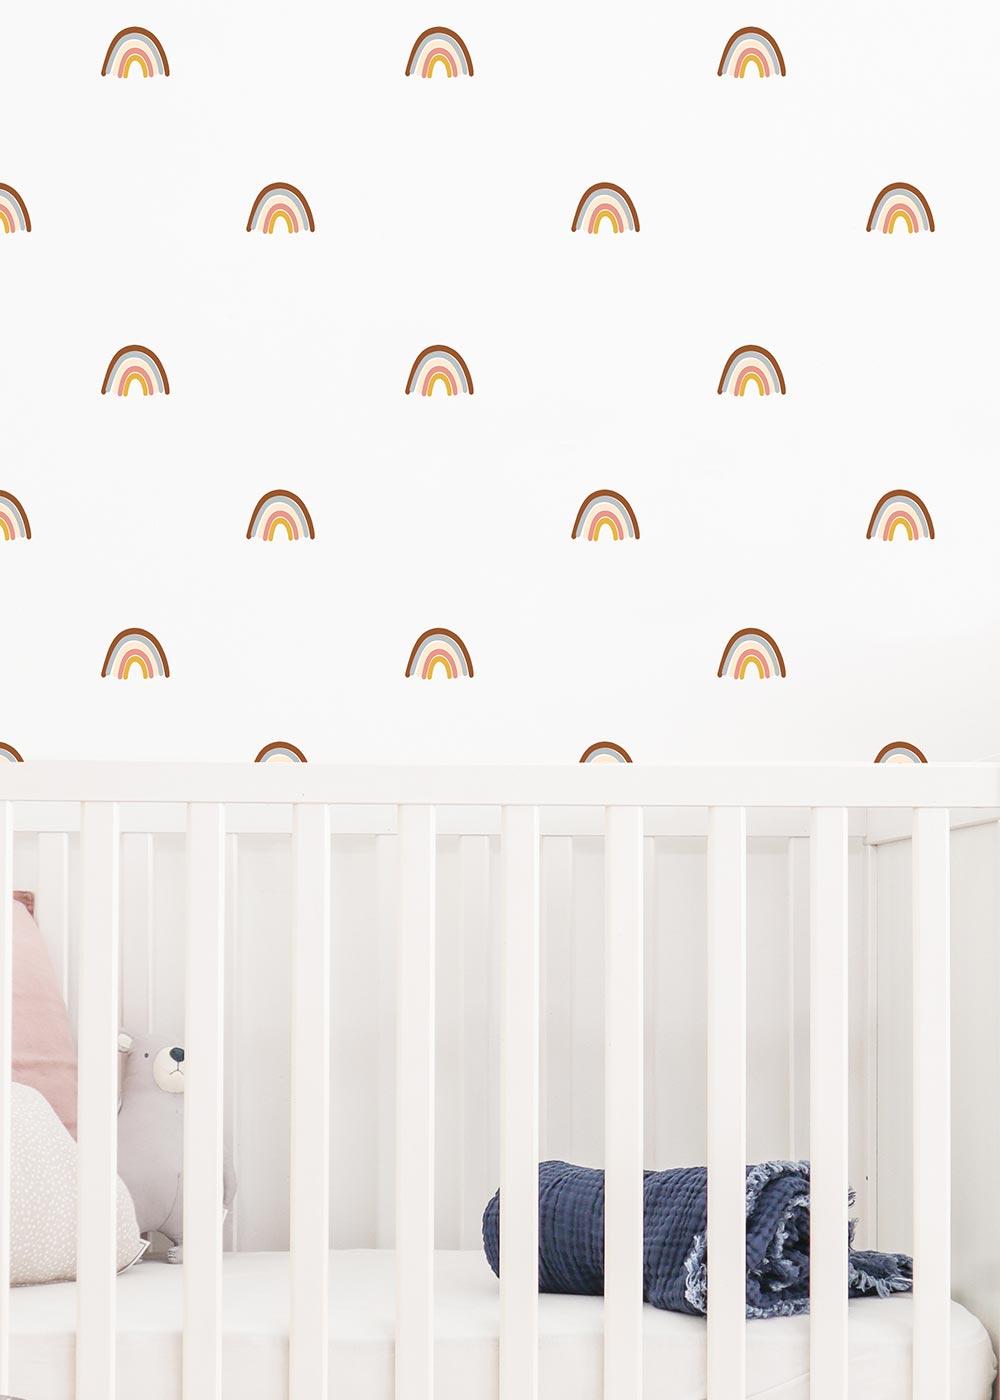 Wandtattoo Regenbögen Wandgestaltung im Kinderzimmer Camel Teilansicht